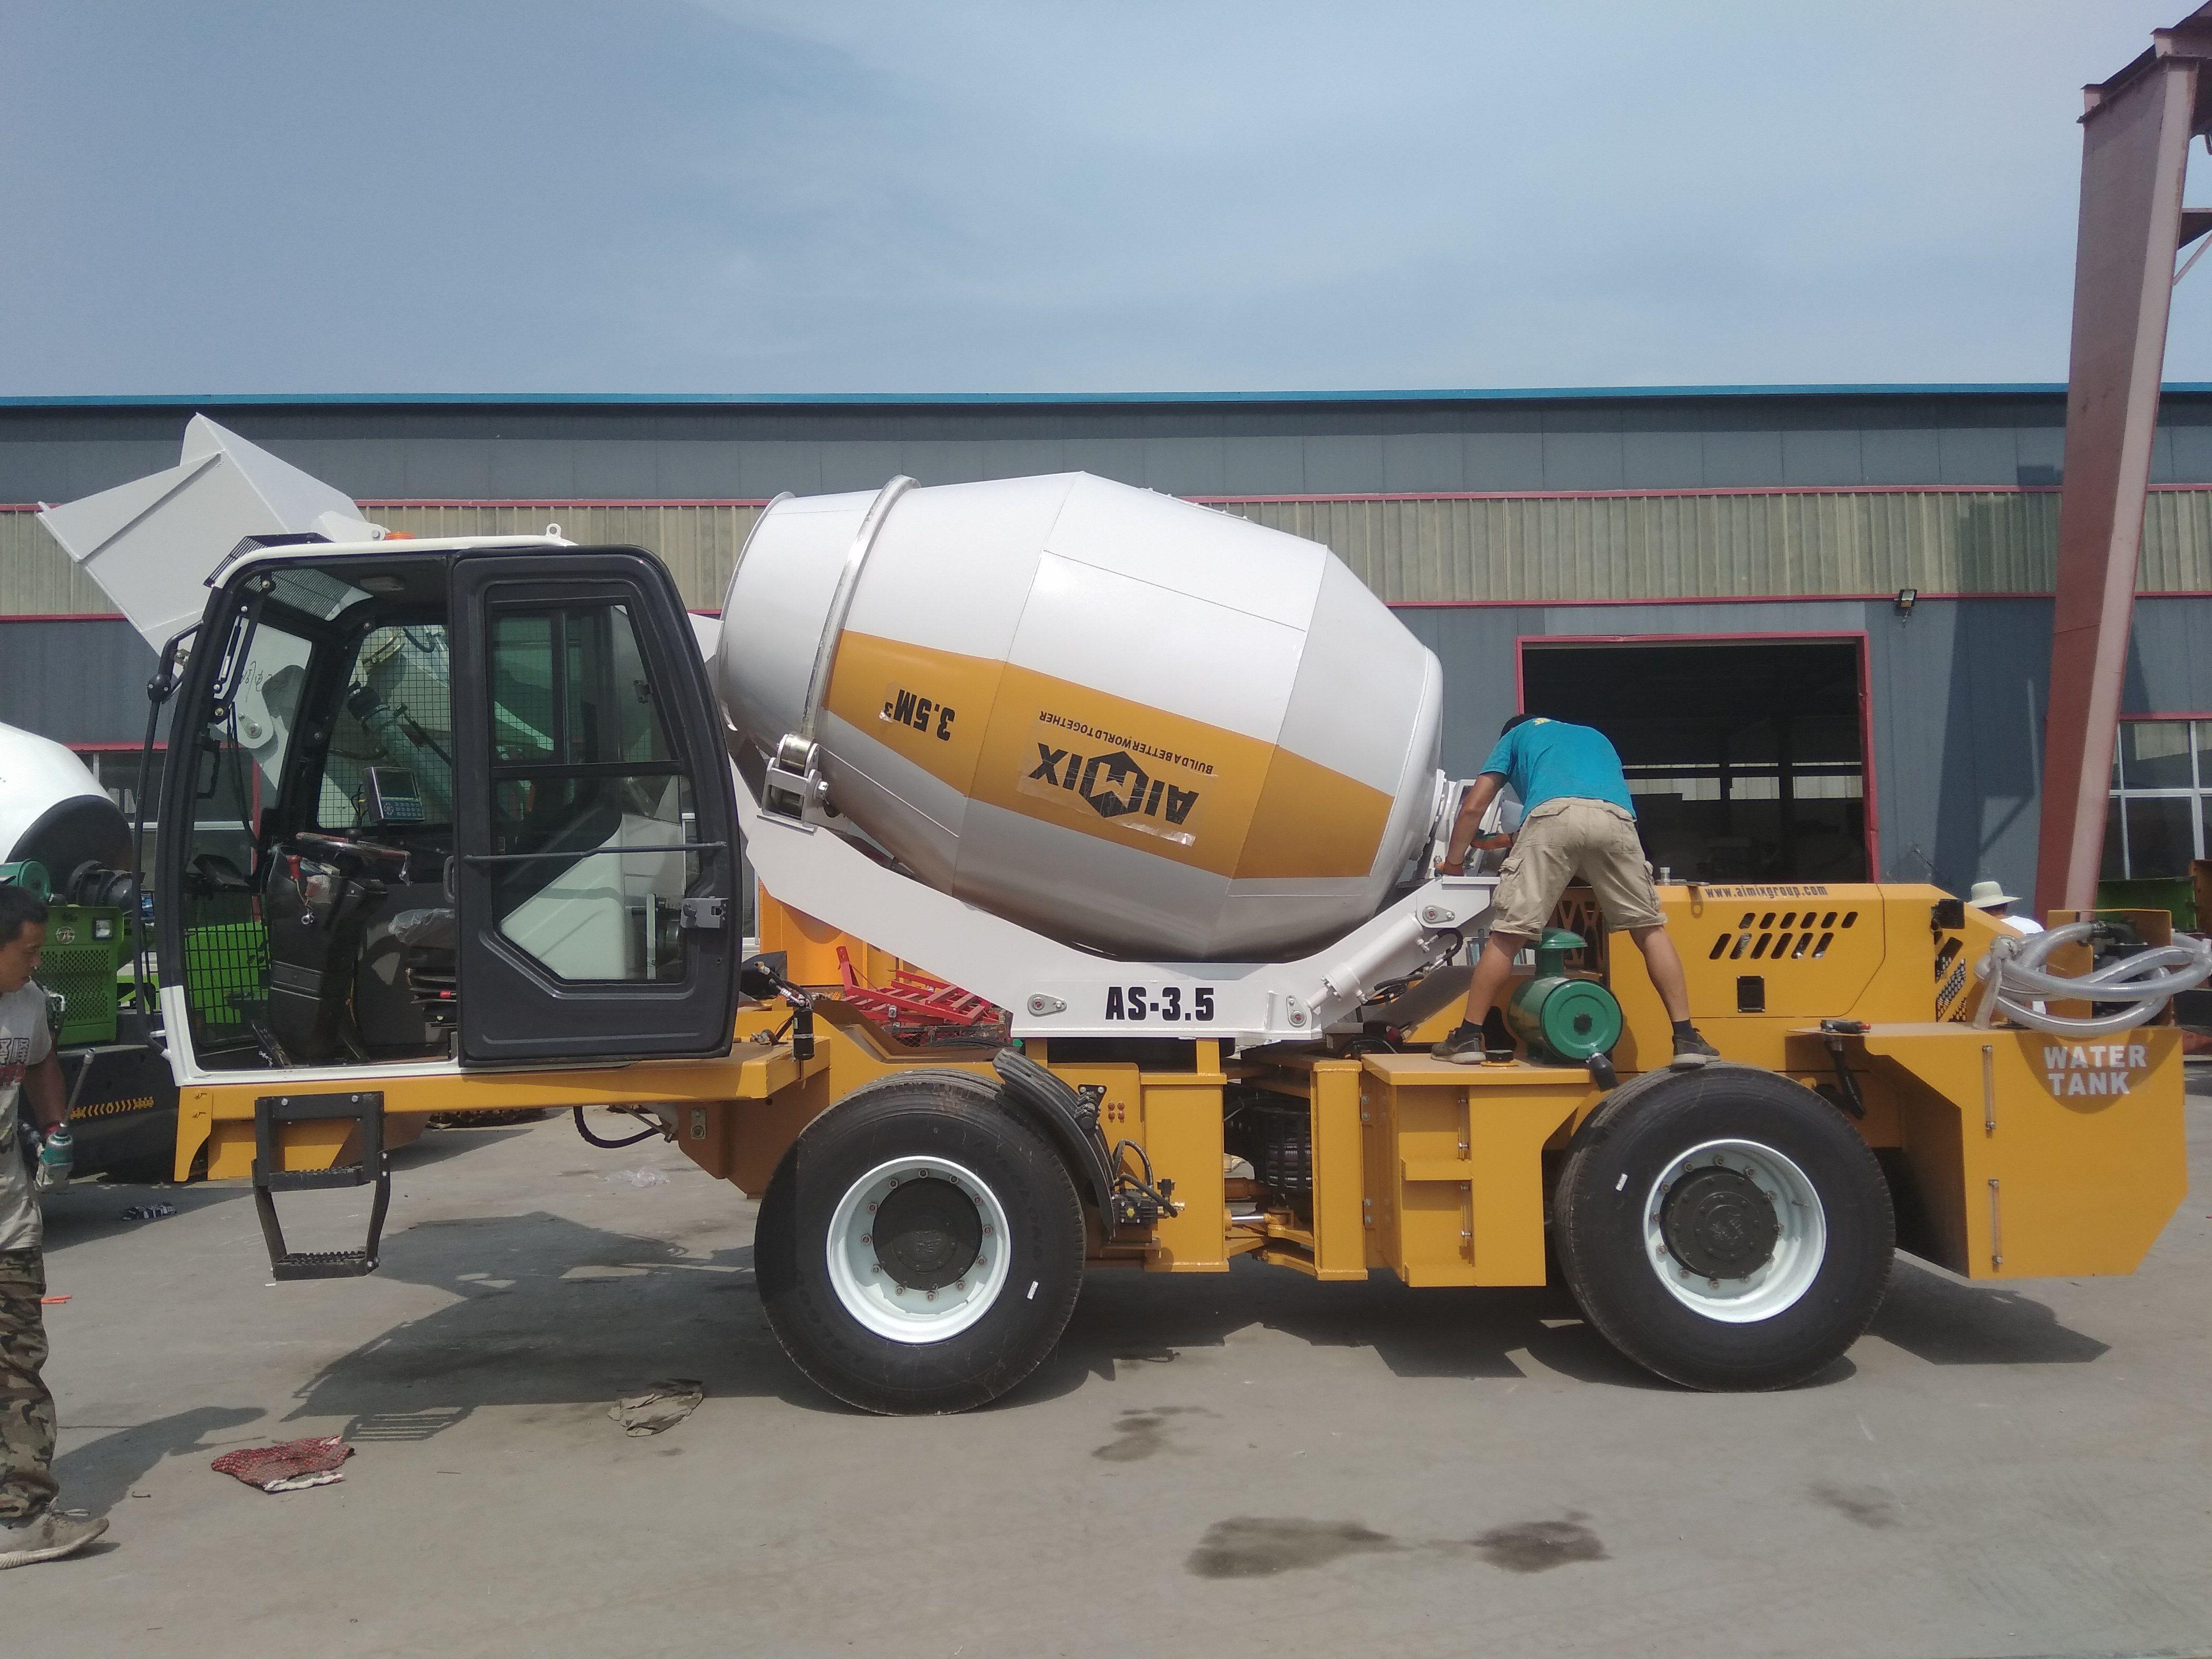 3 5m3 Self Loading Concrete Mixer Truck In 2020 Mixer Truck Concrete Mixers Trucks For Sale